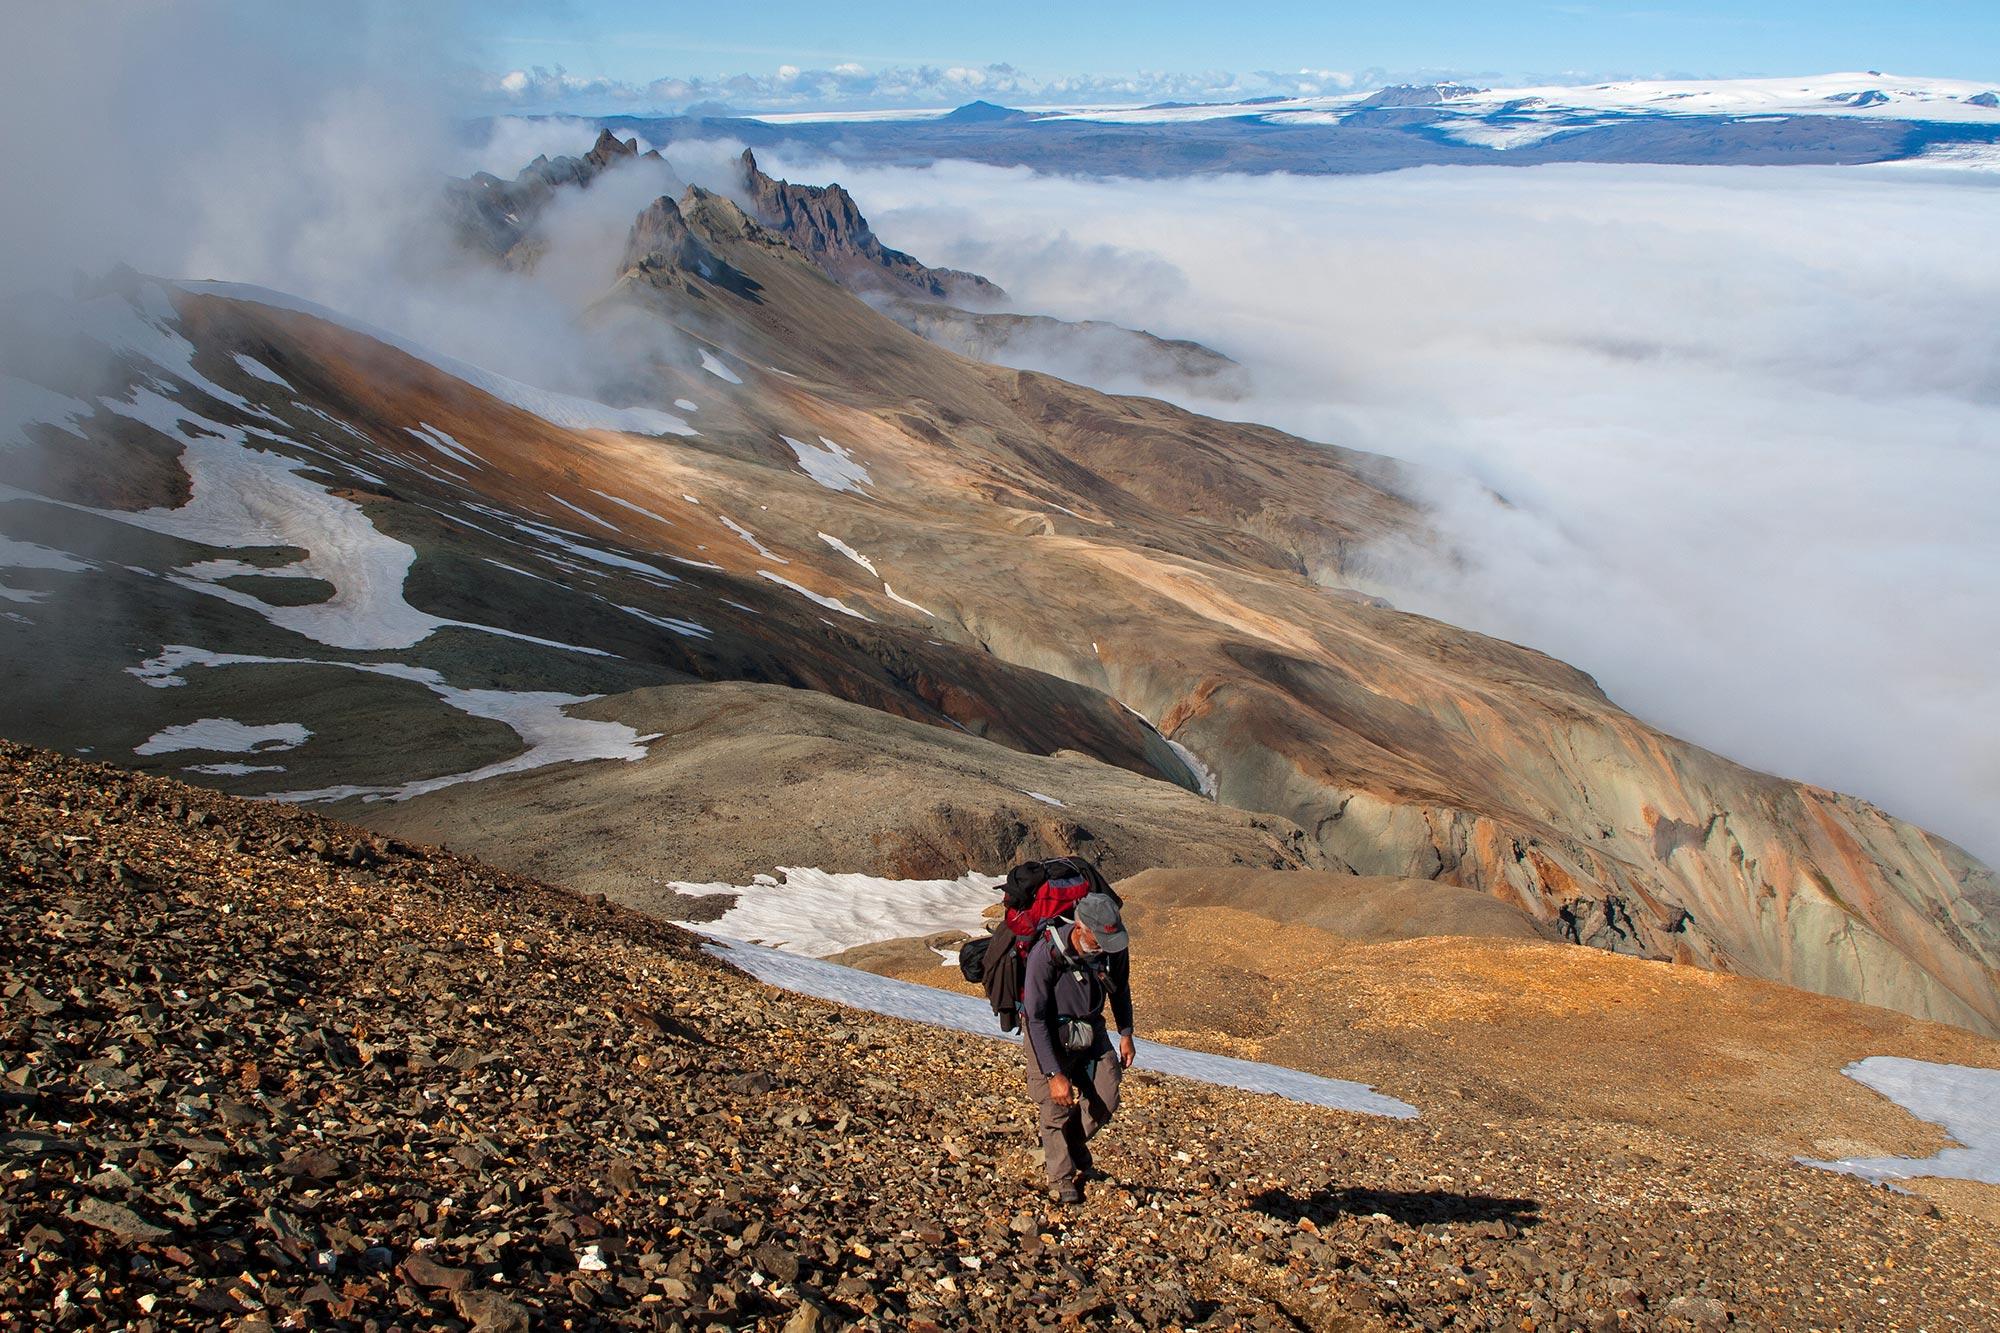 A hiker on the Nupsstadaskogur to Skaftafell Trekking Tour in the Highlands